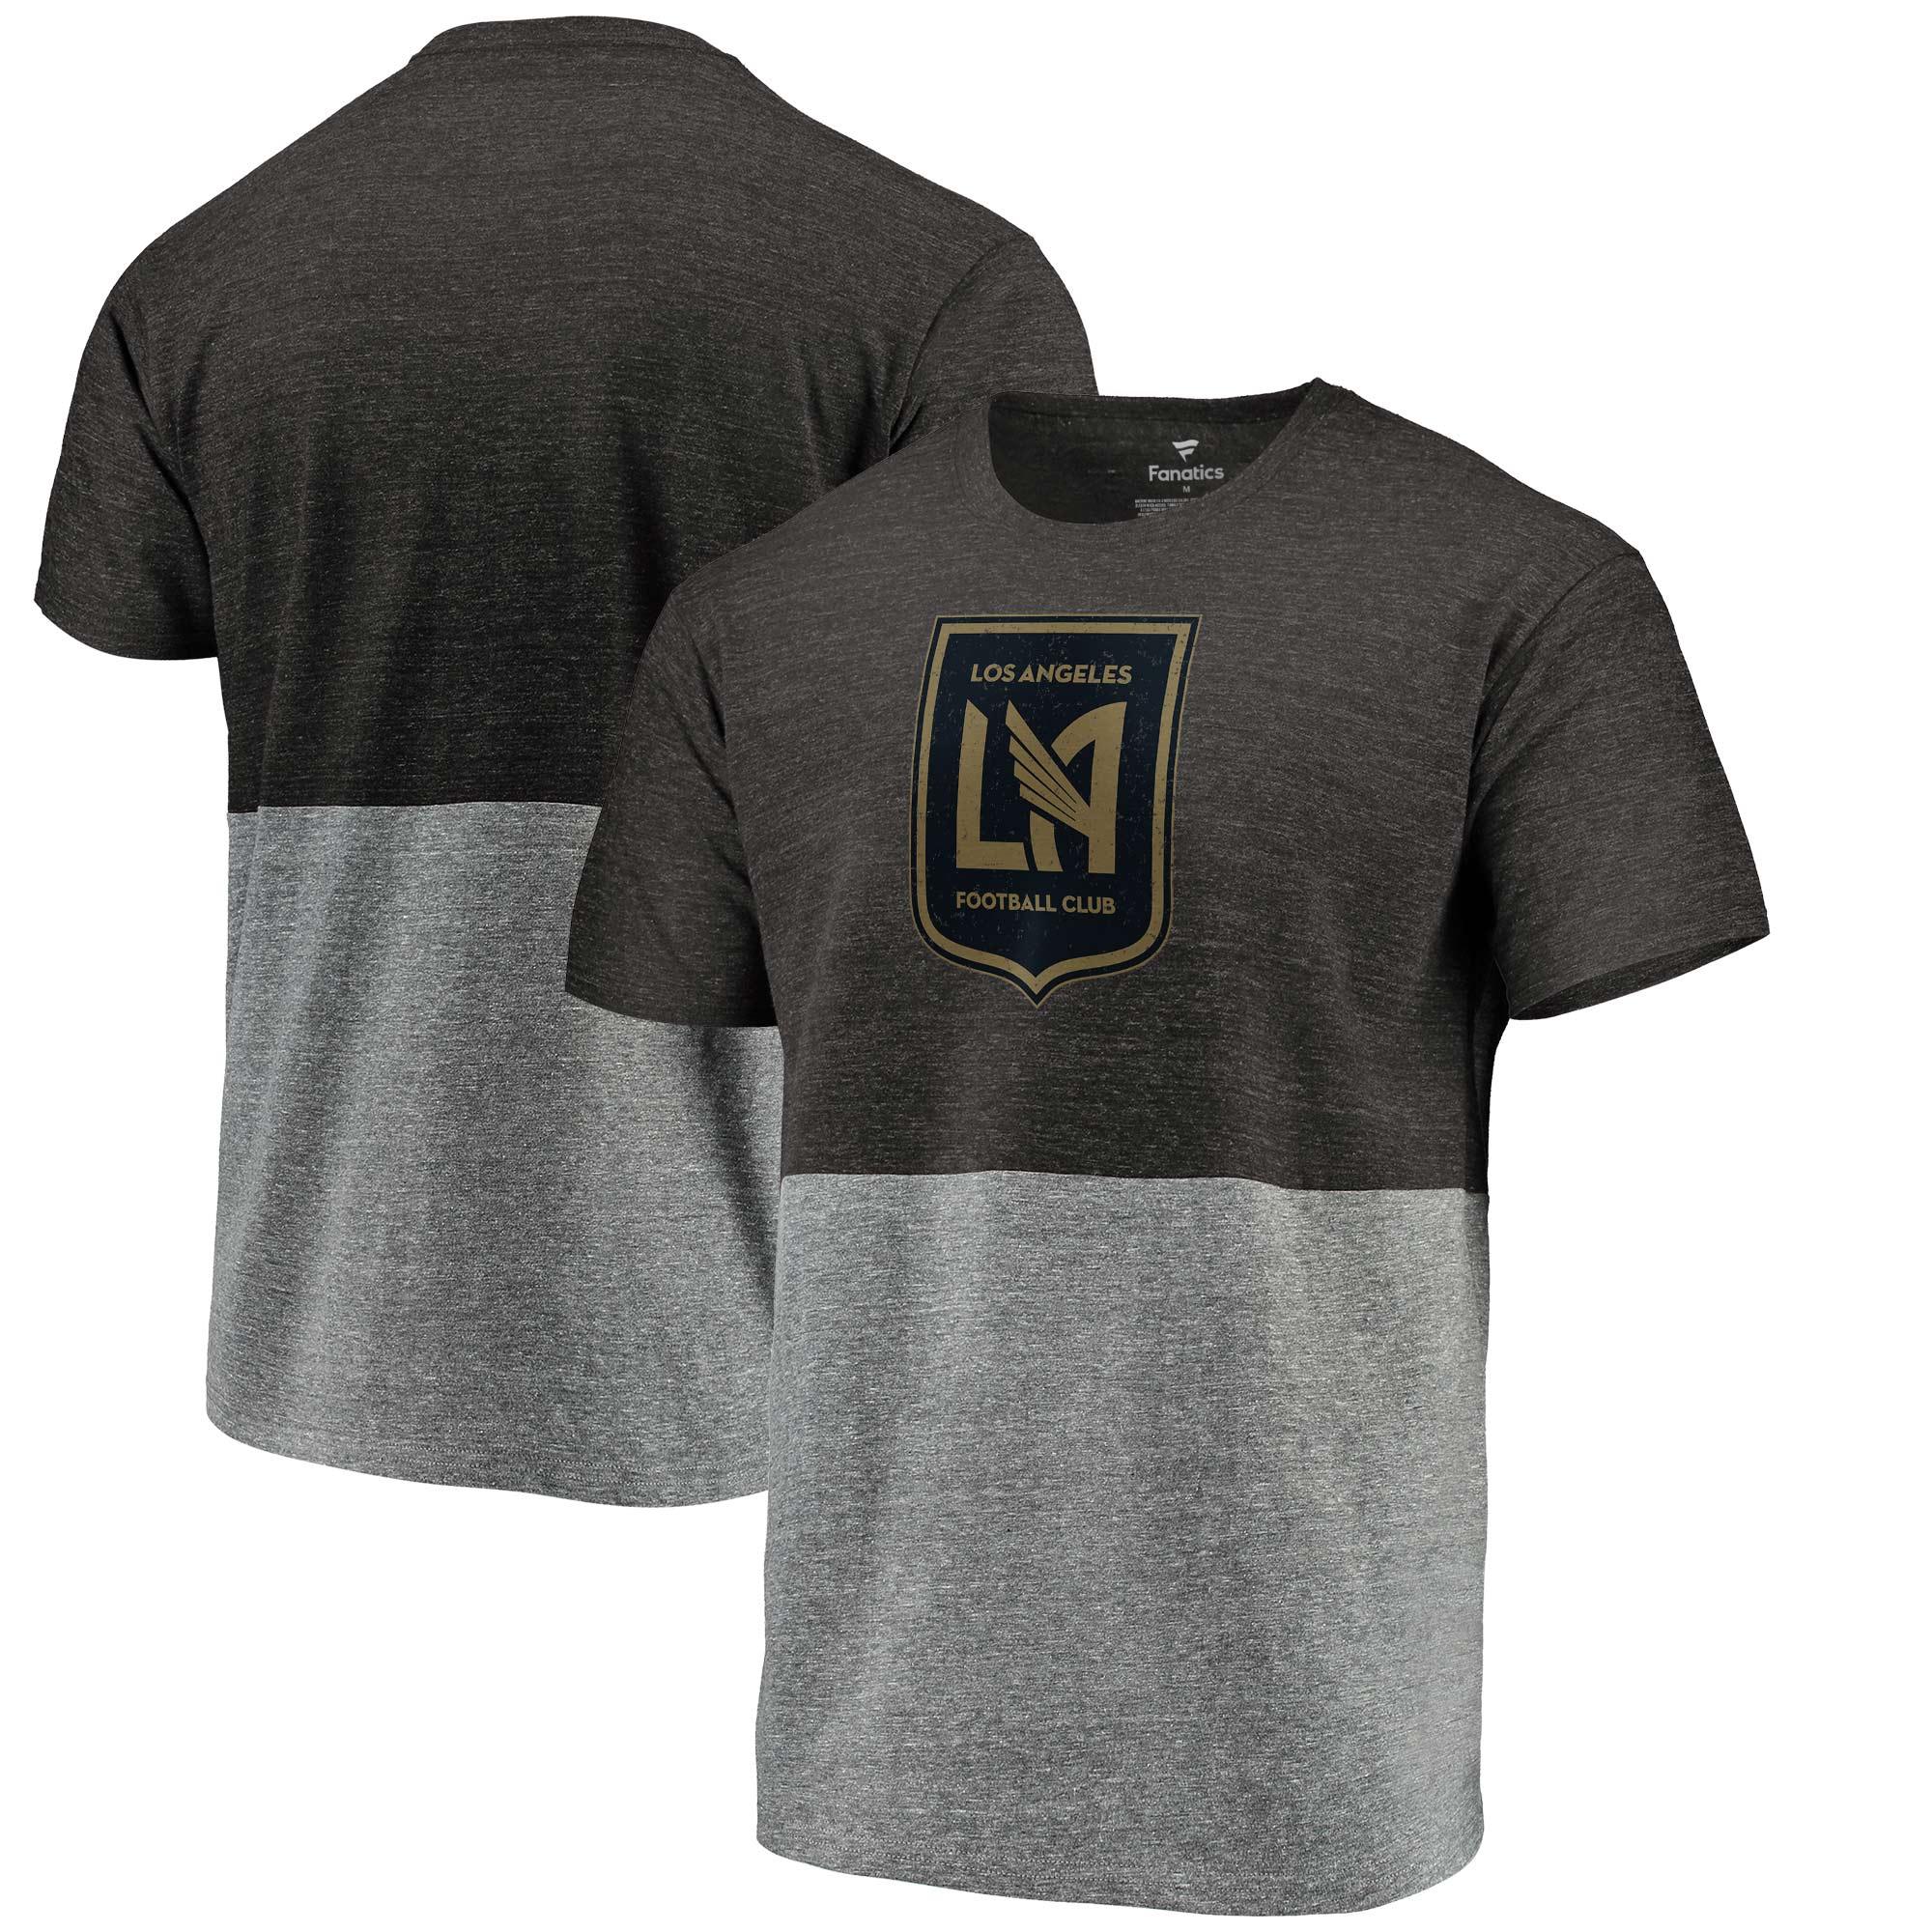 LAFC Fanatics Branded Colorblock Tri-Blend T-Shirt - Black/Heathered Gray